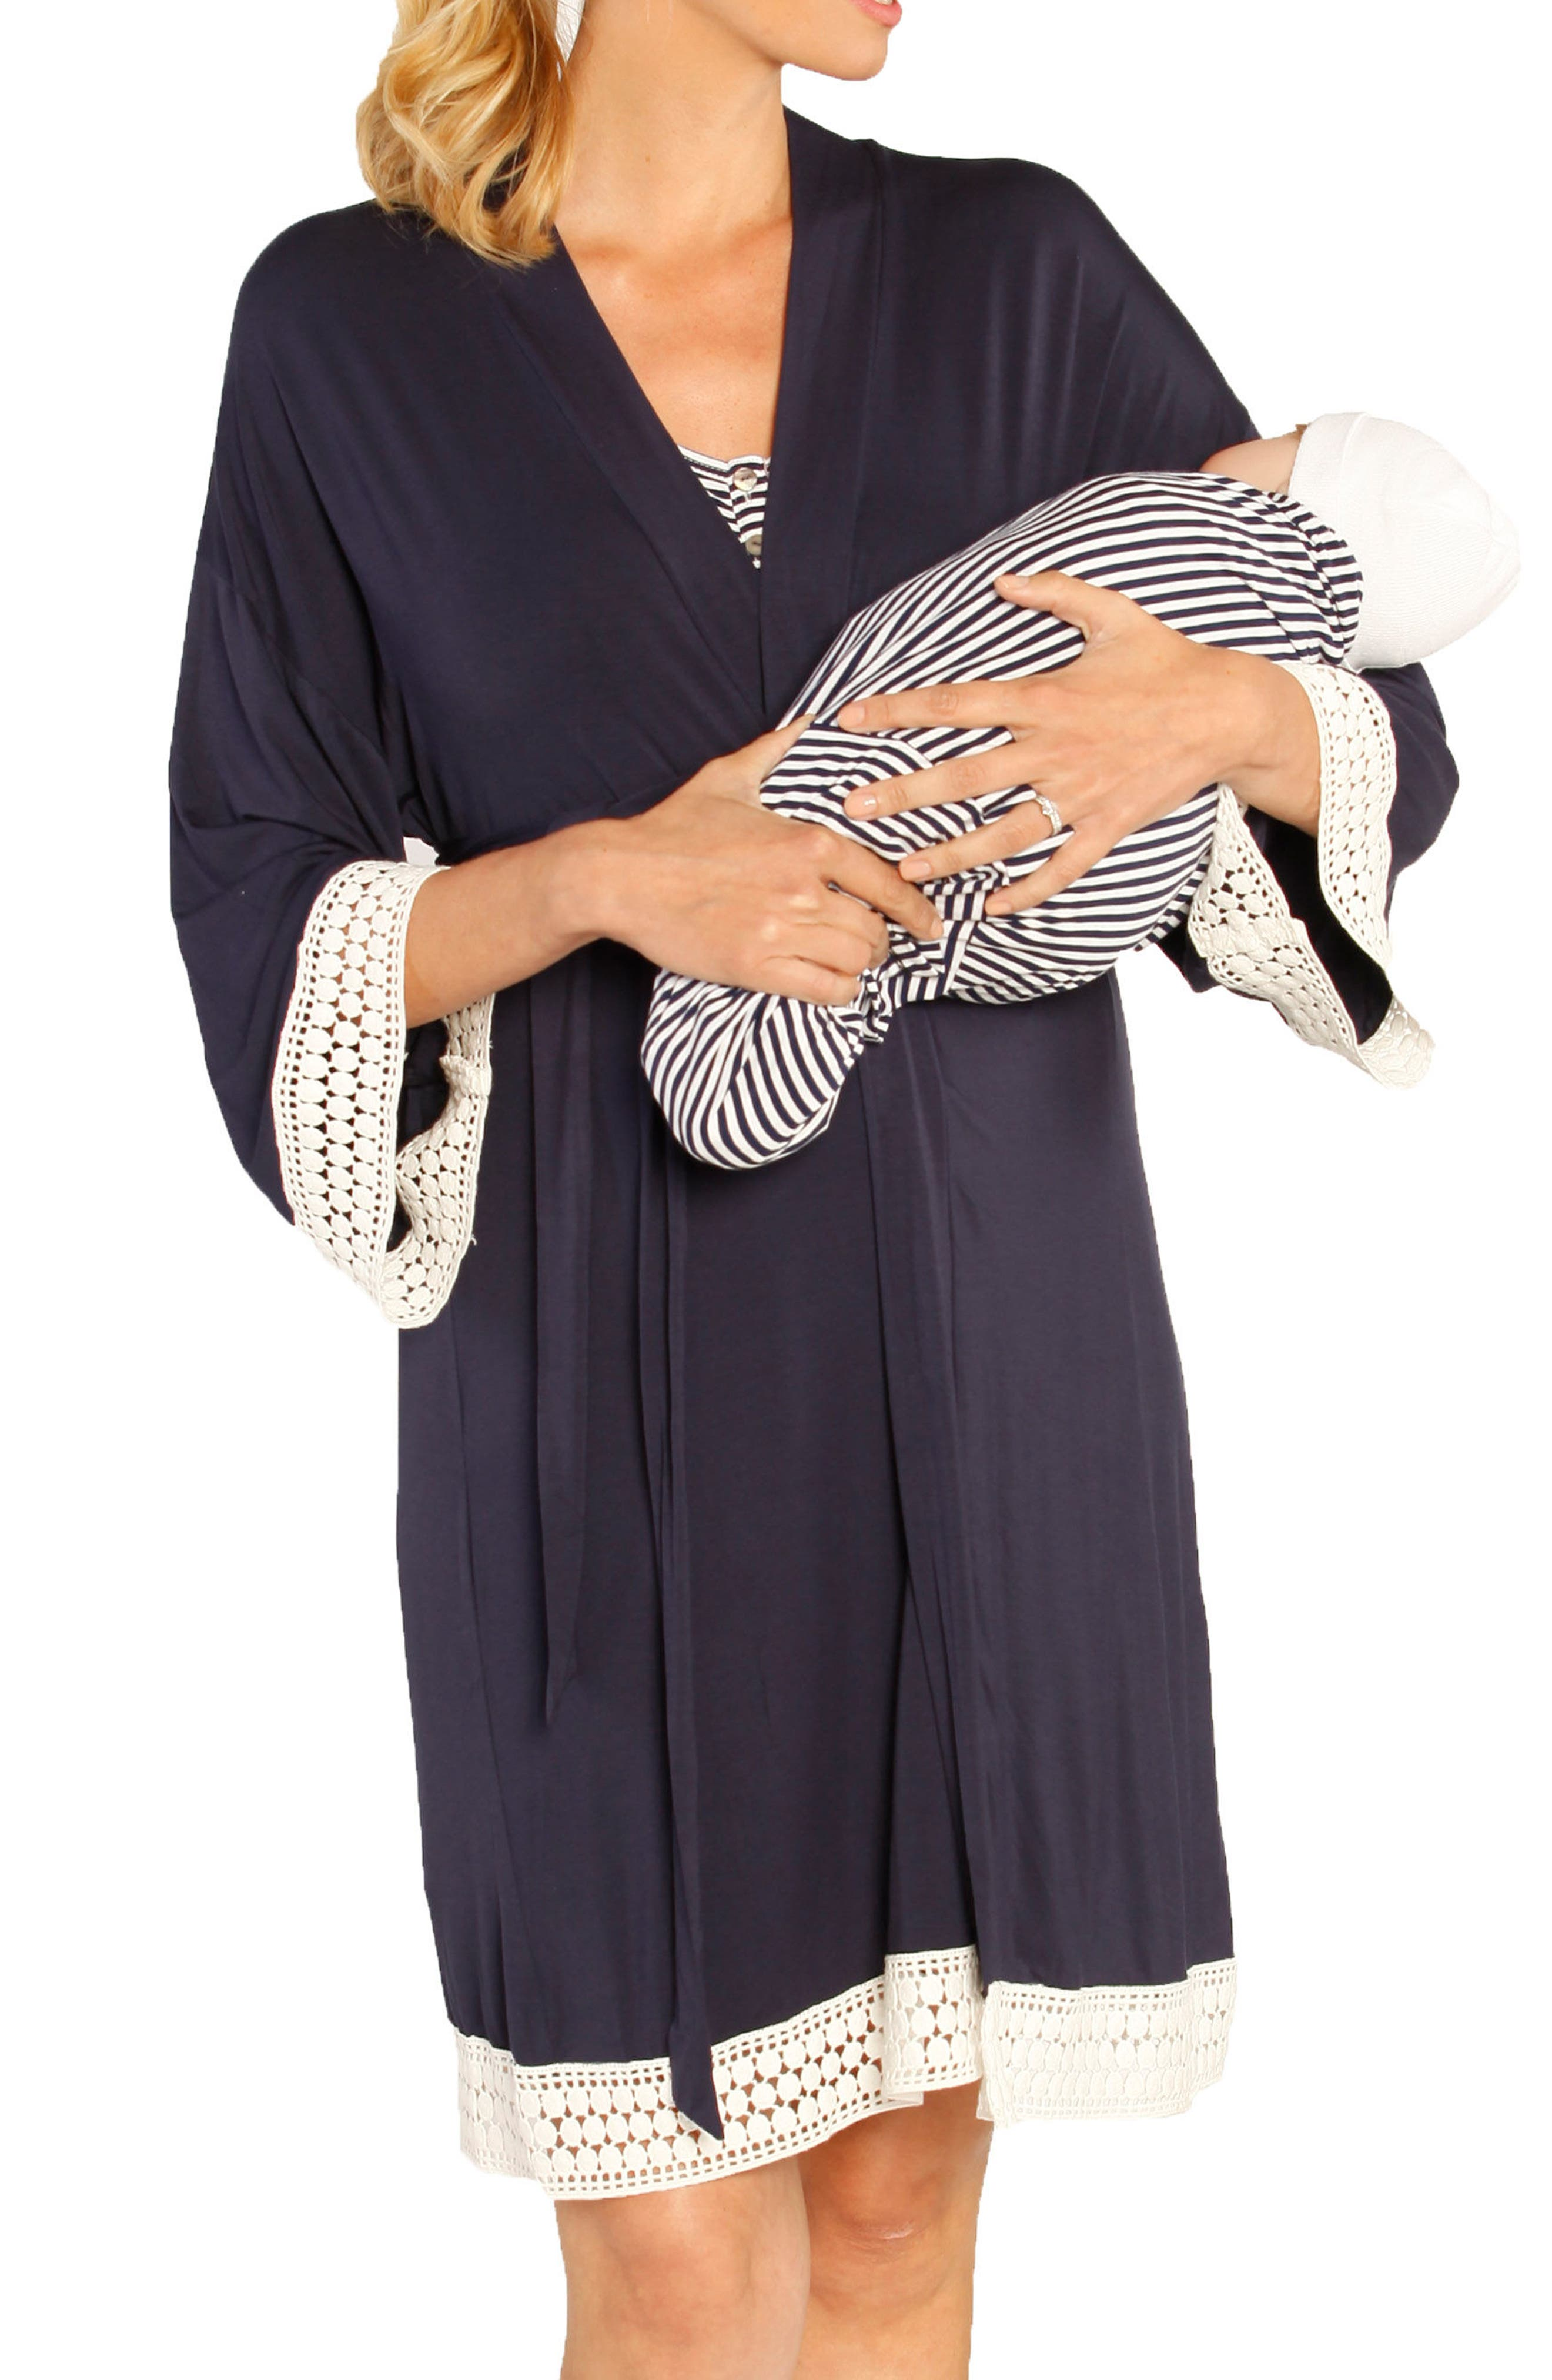 Cranberry Maternity Dresses